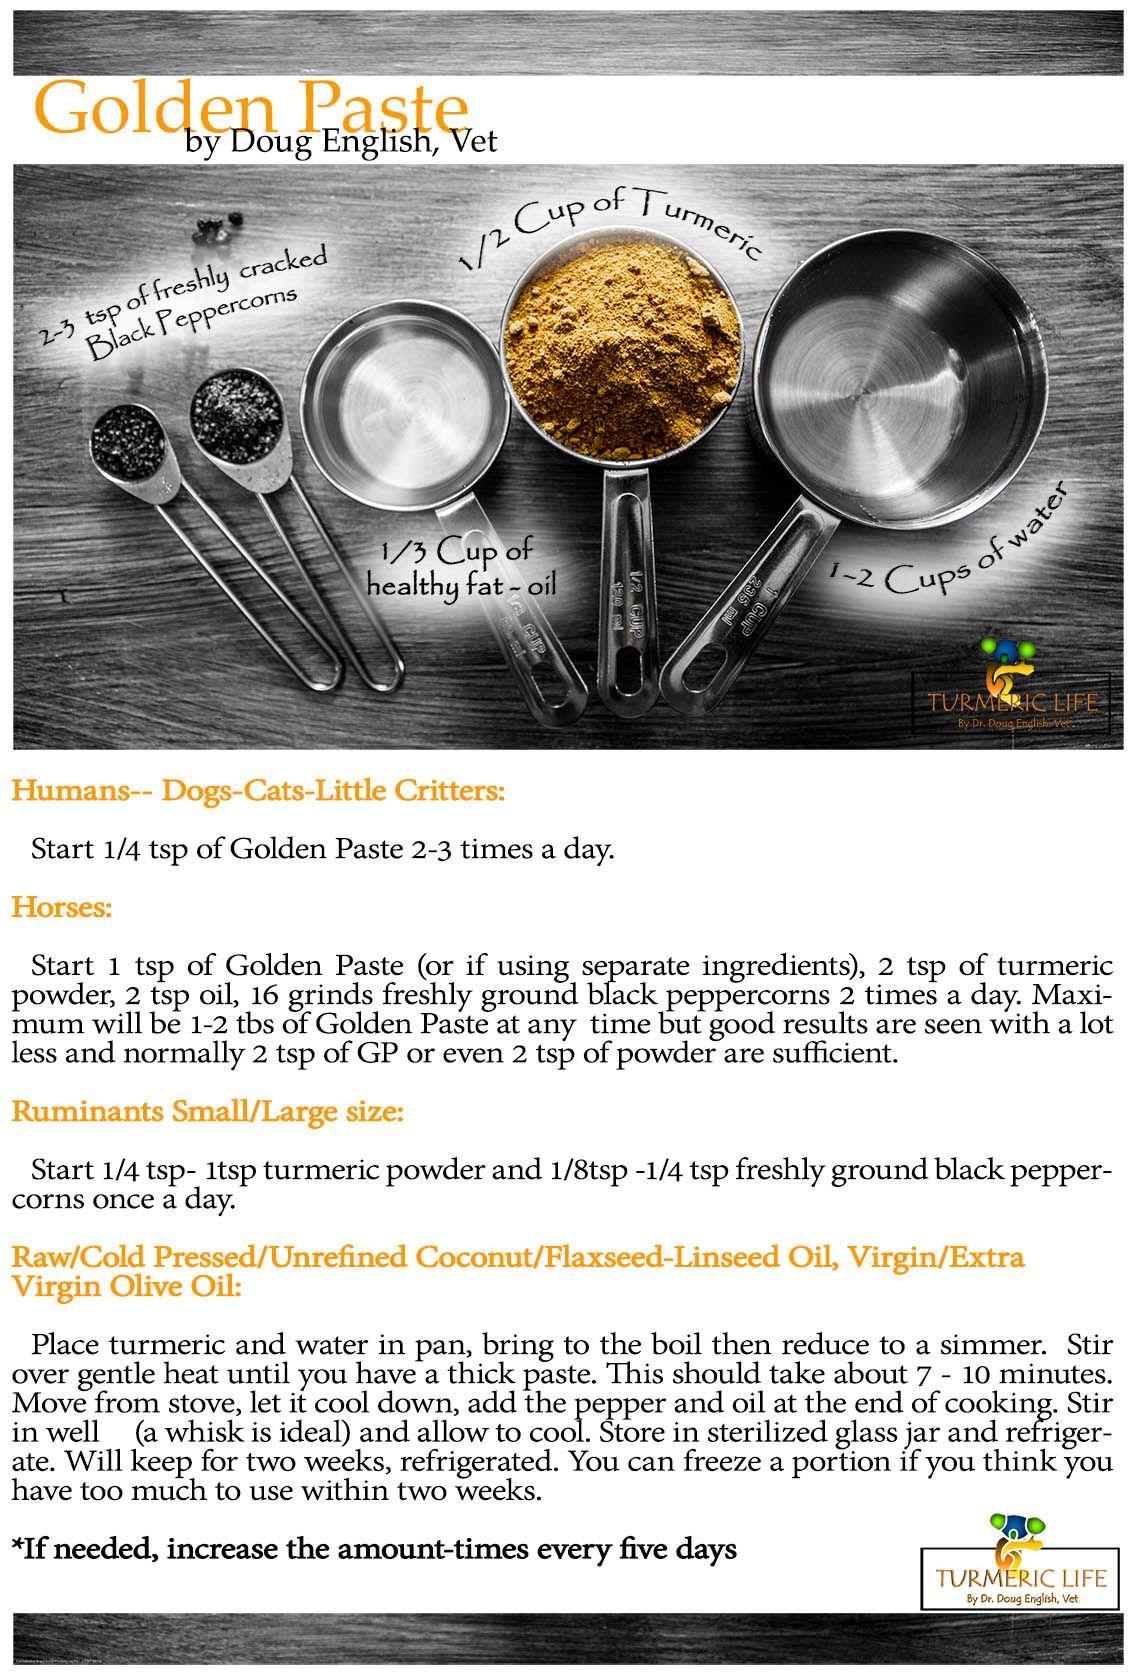 Turmeric Golden Paste Doug English Turmeric Life Turmeric Recipes Golden Paste Turmeric Golden Paste